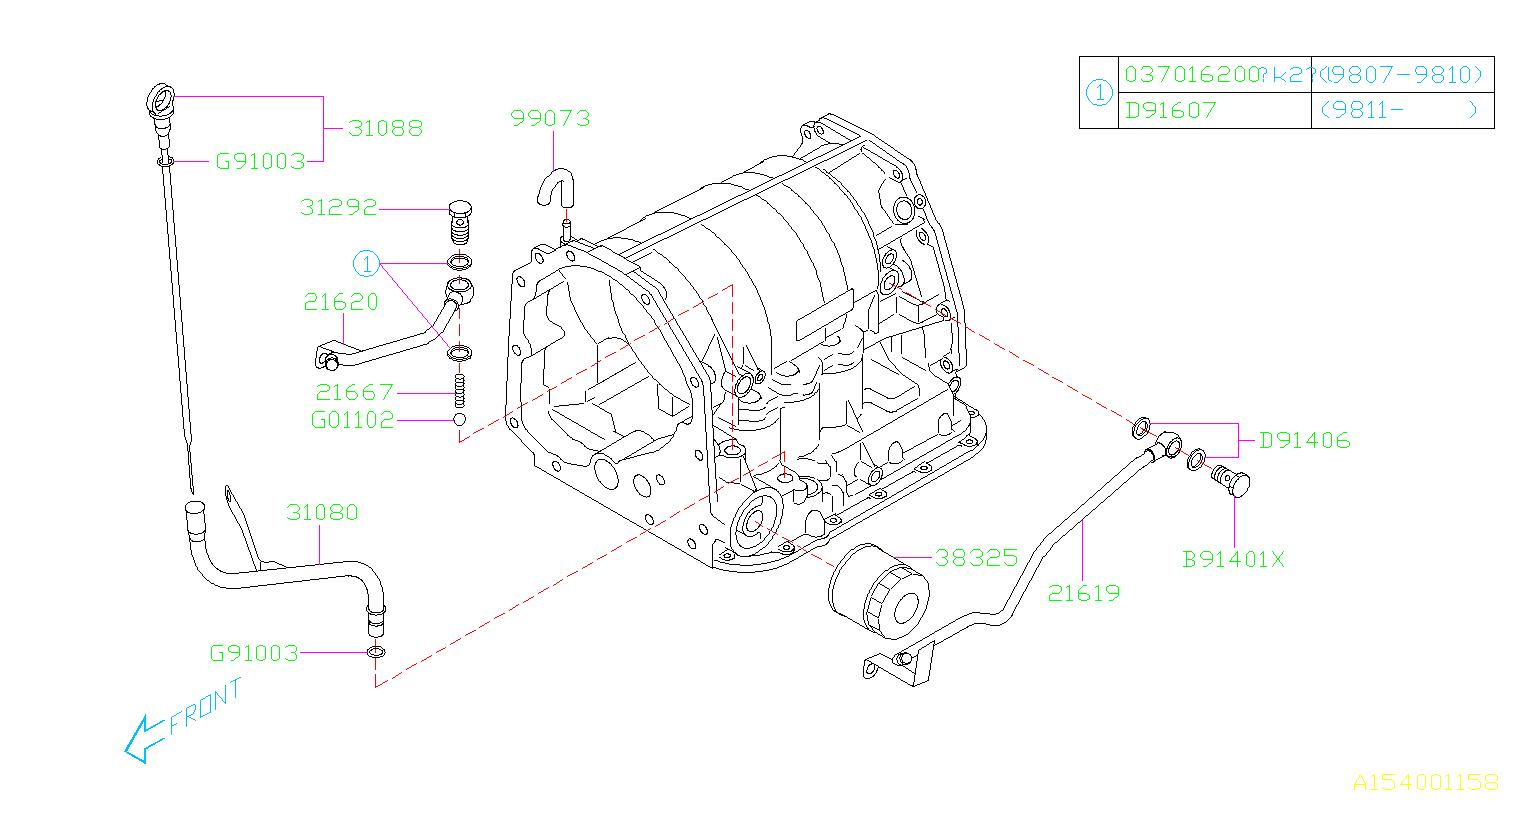 Subaru Impreza Automatic Transmission Dipstick Tube  Pipe Oil Charging  Pipe Cp Oil